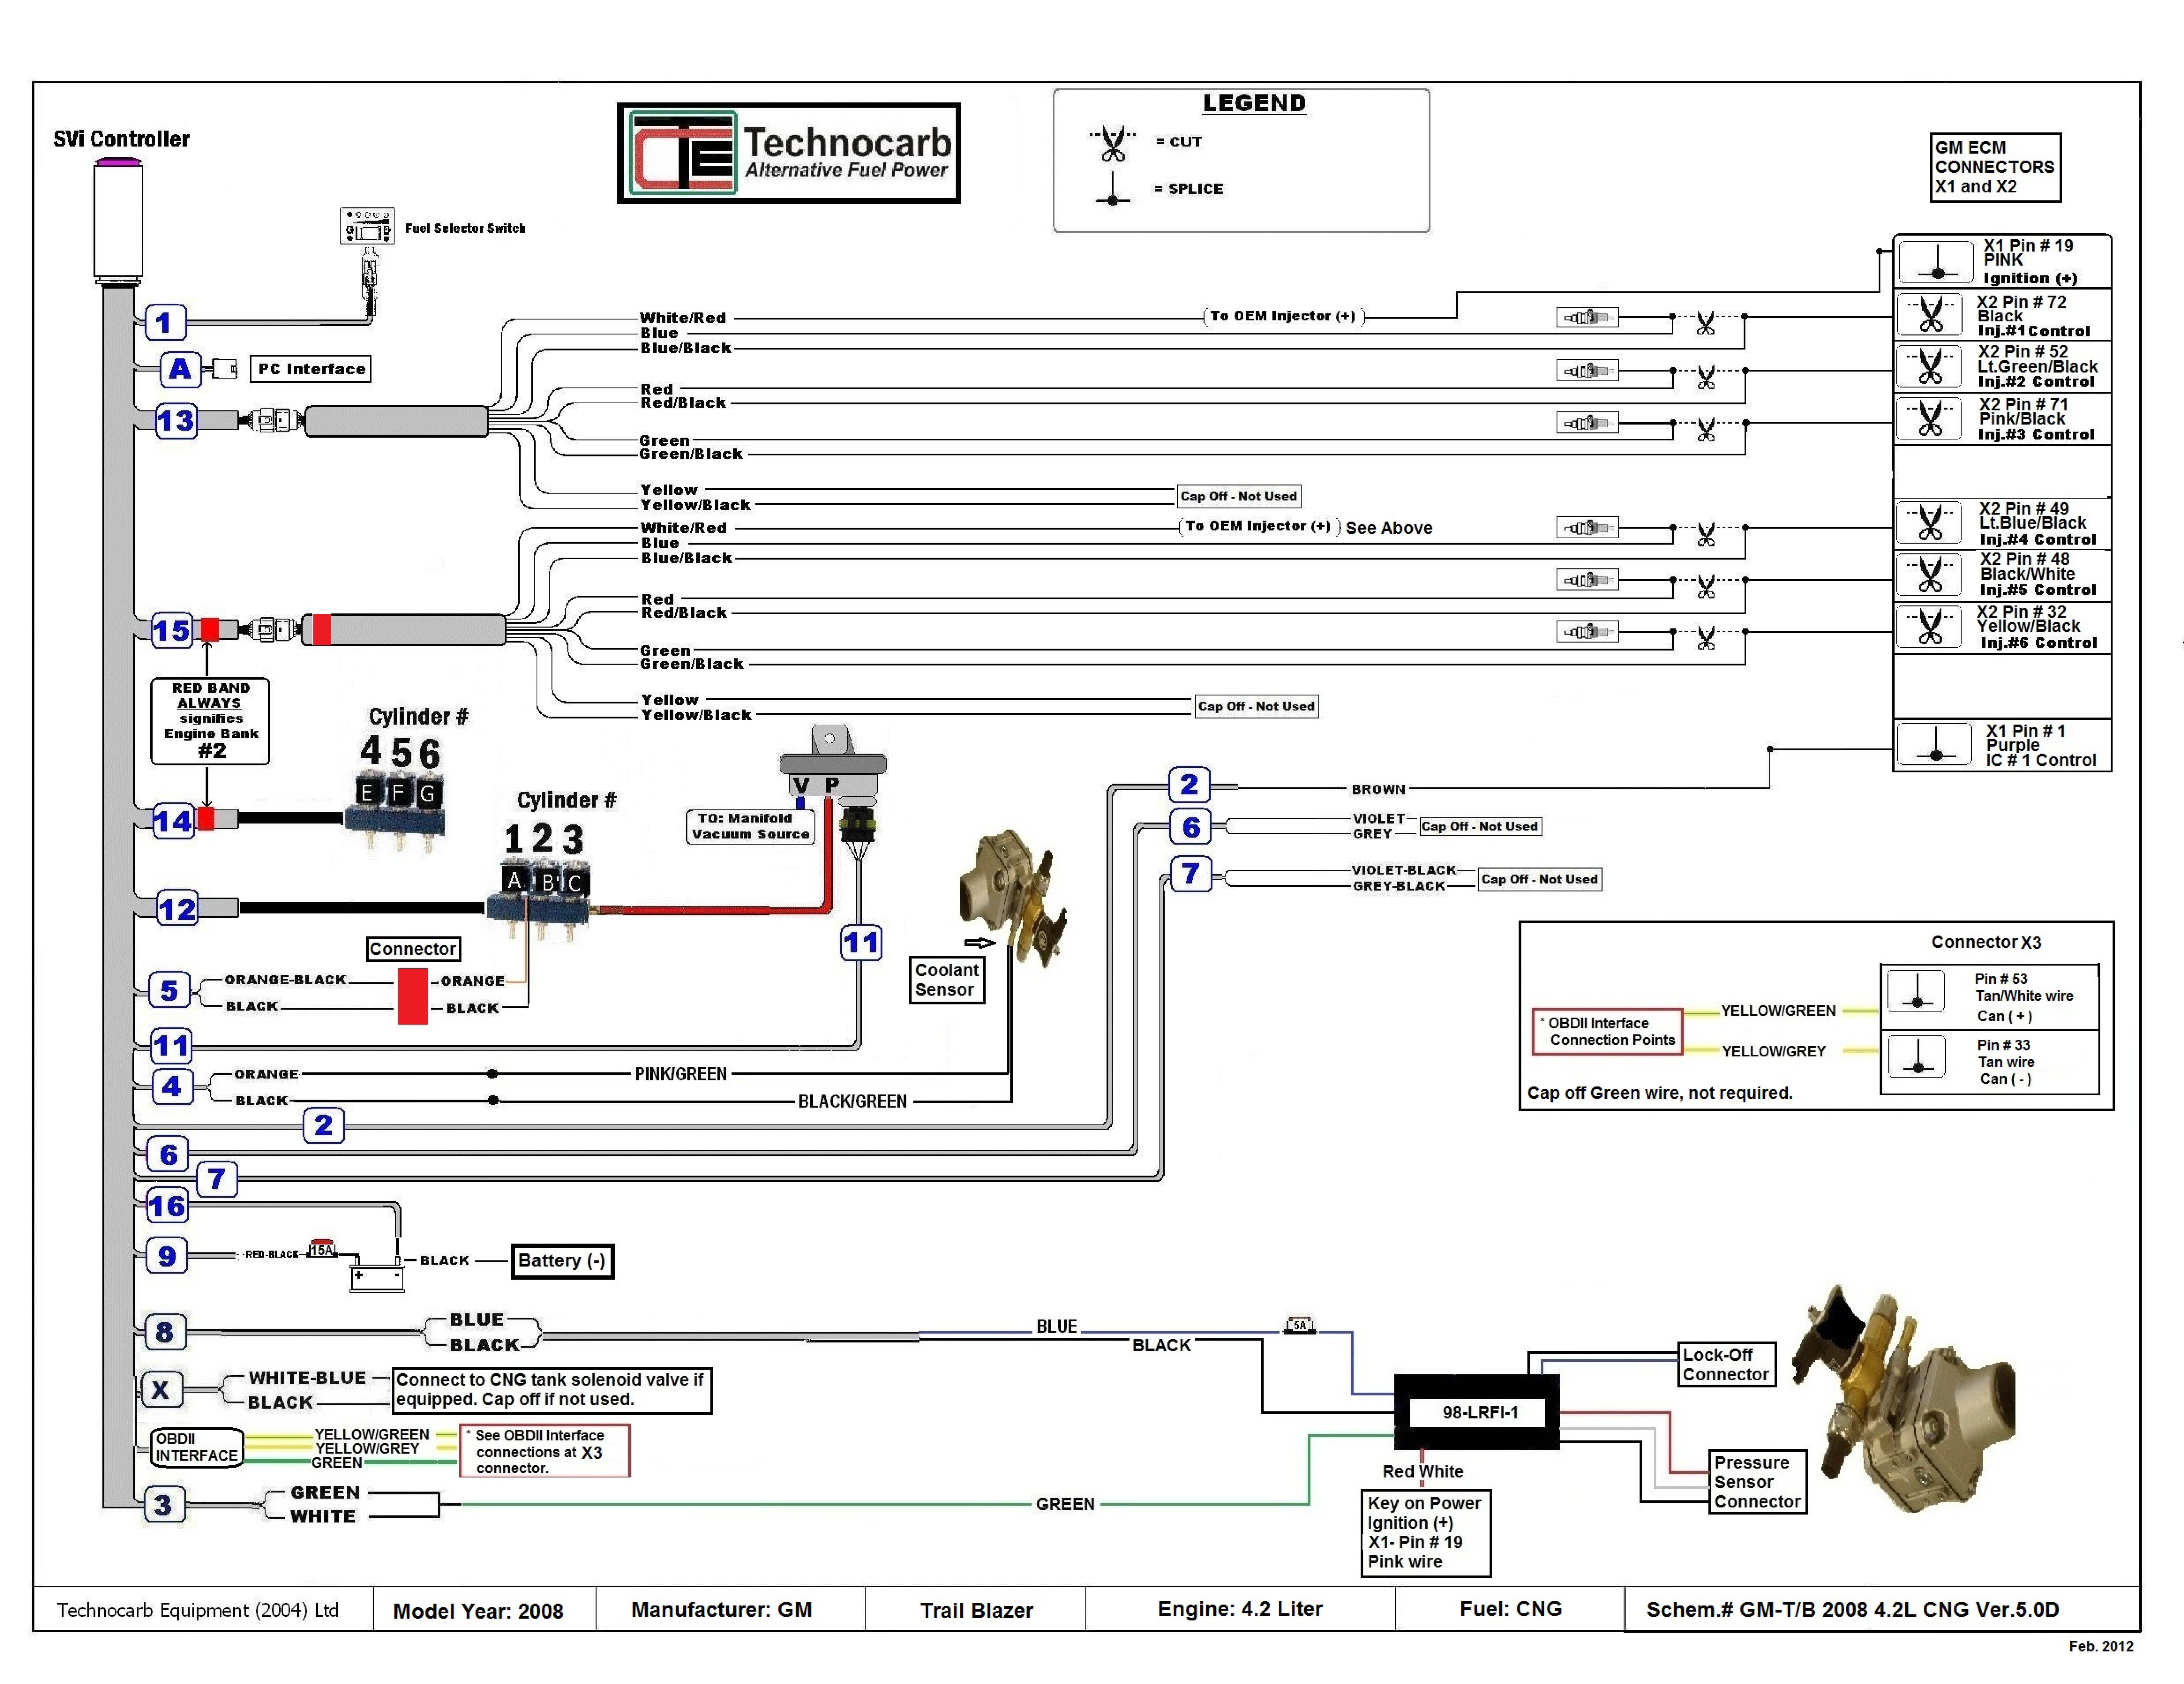 Astonishing 2003 Trailblazer Ac Wiring Diagram Diagram Data Schema Wiring Cloud Waroletkolfr09Org